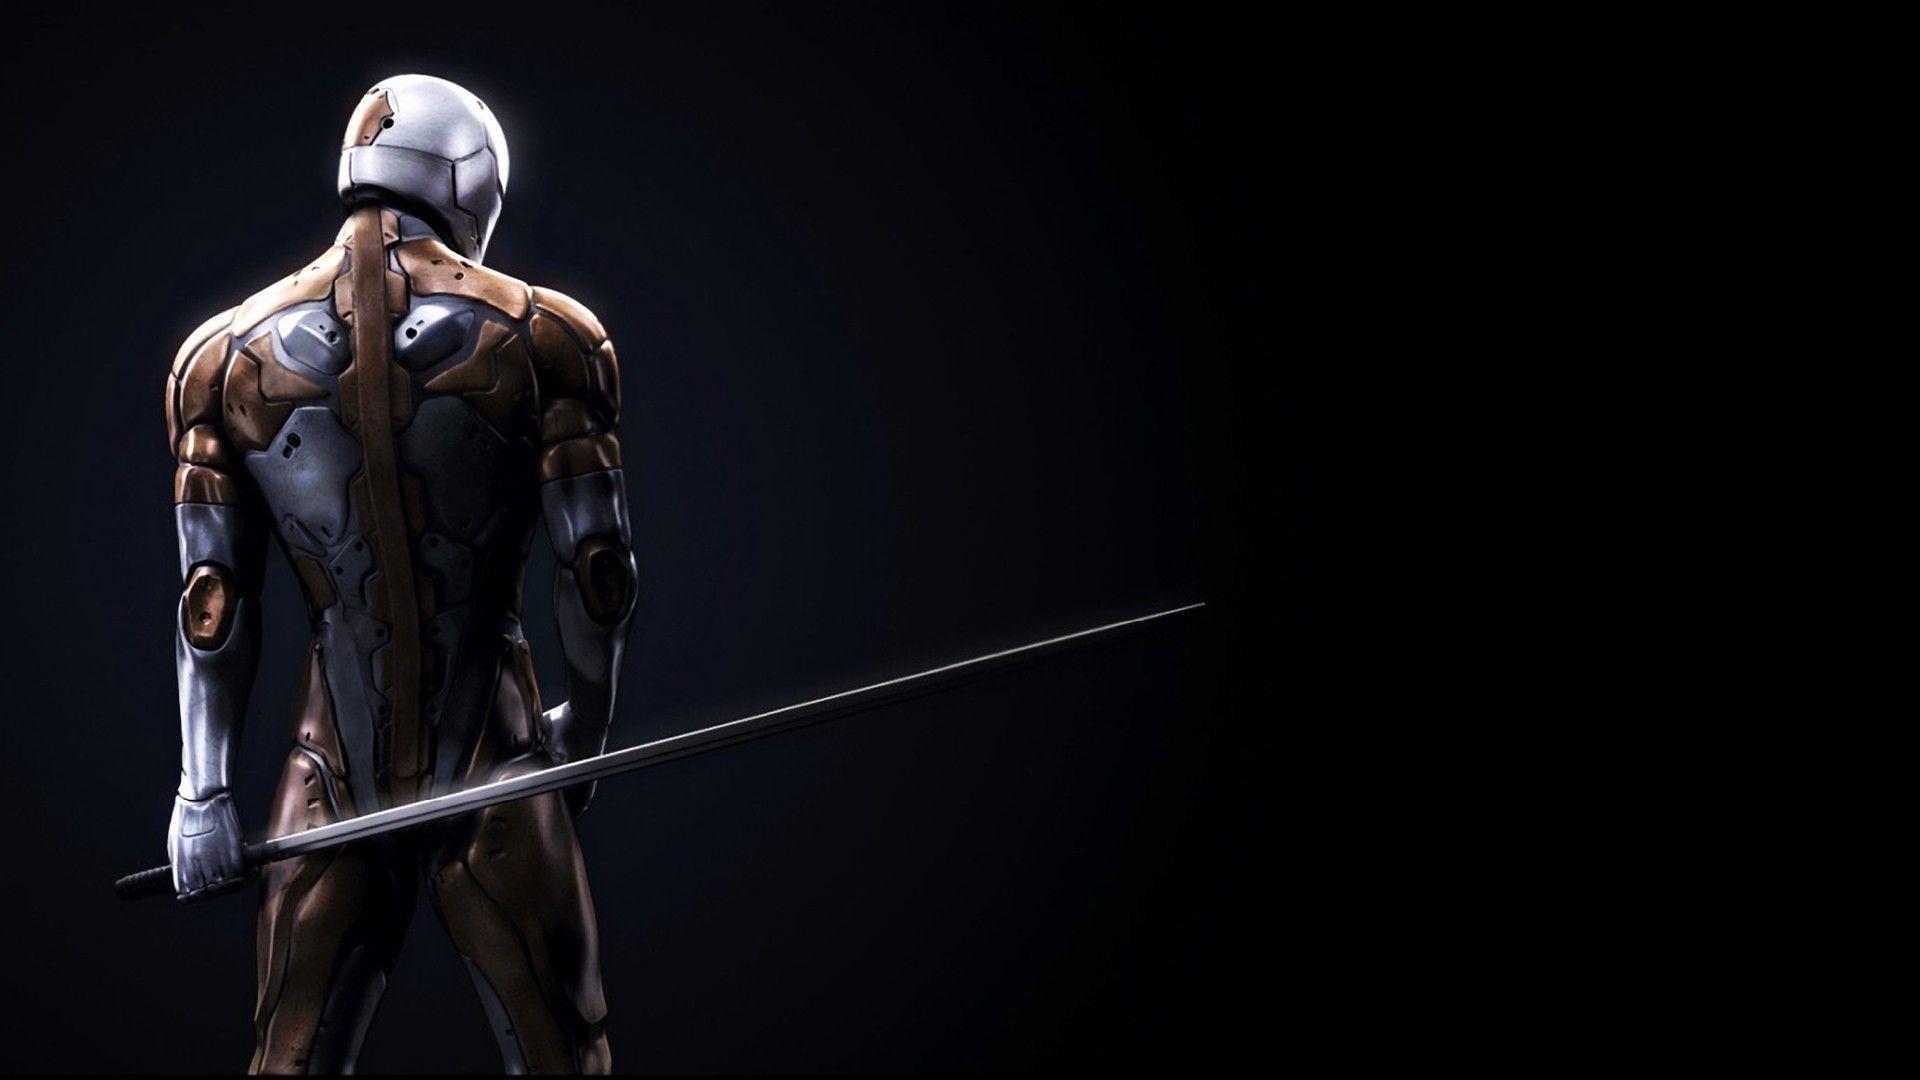 Gray Fox Metal Gear Solid Wallpaper #2228 HD Game .